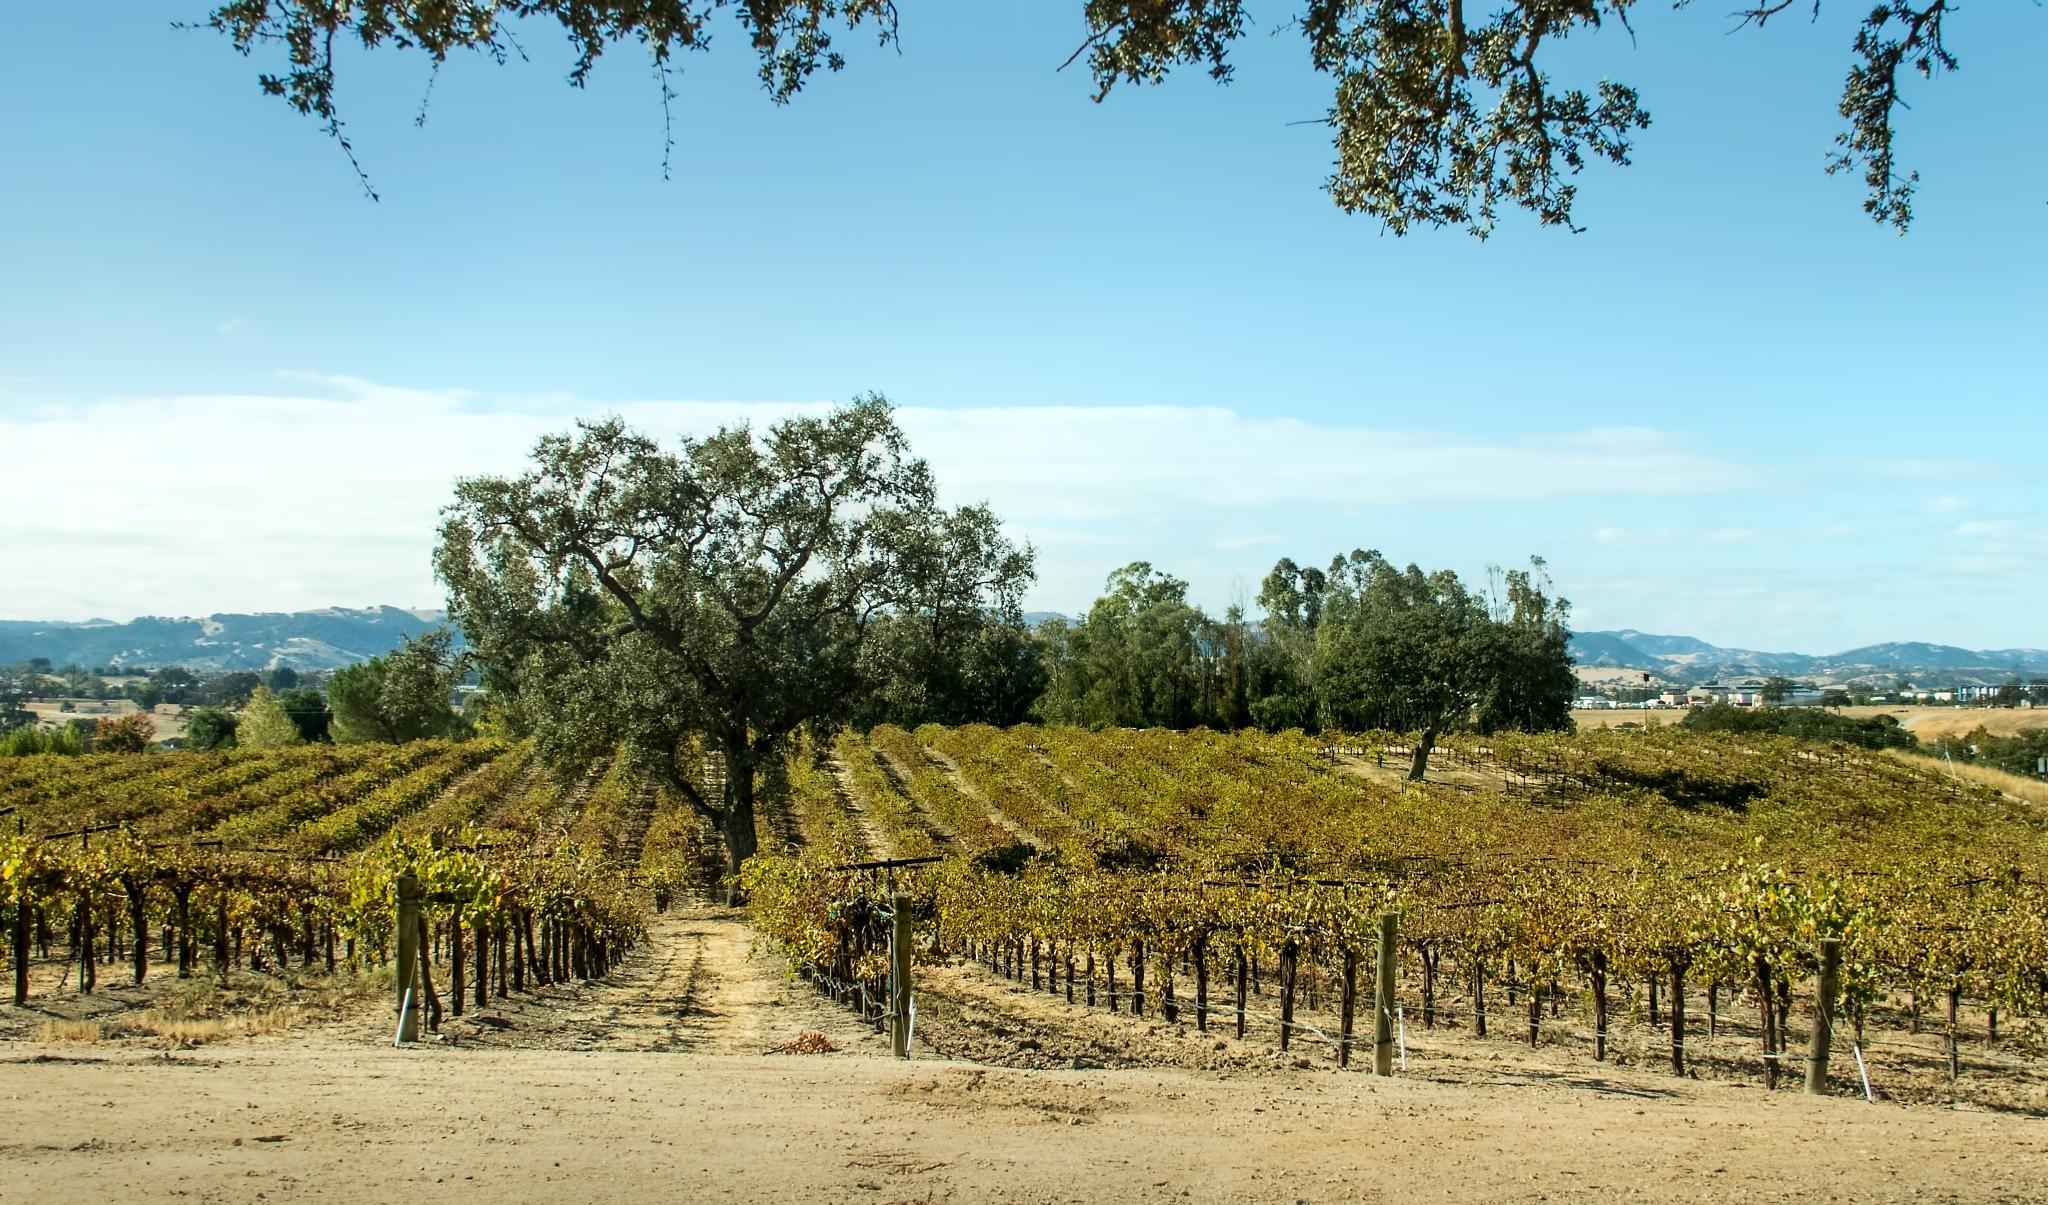 Califrornia Vineyard by Bobjb